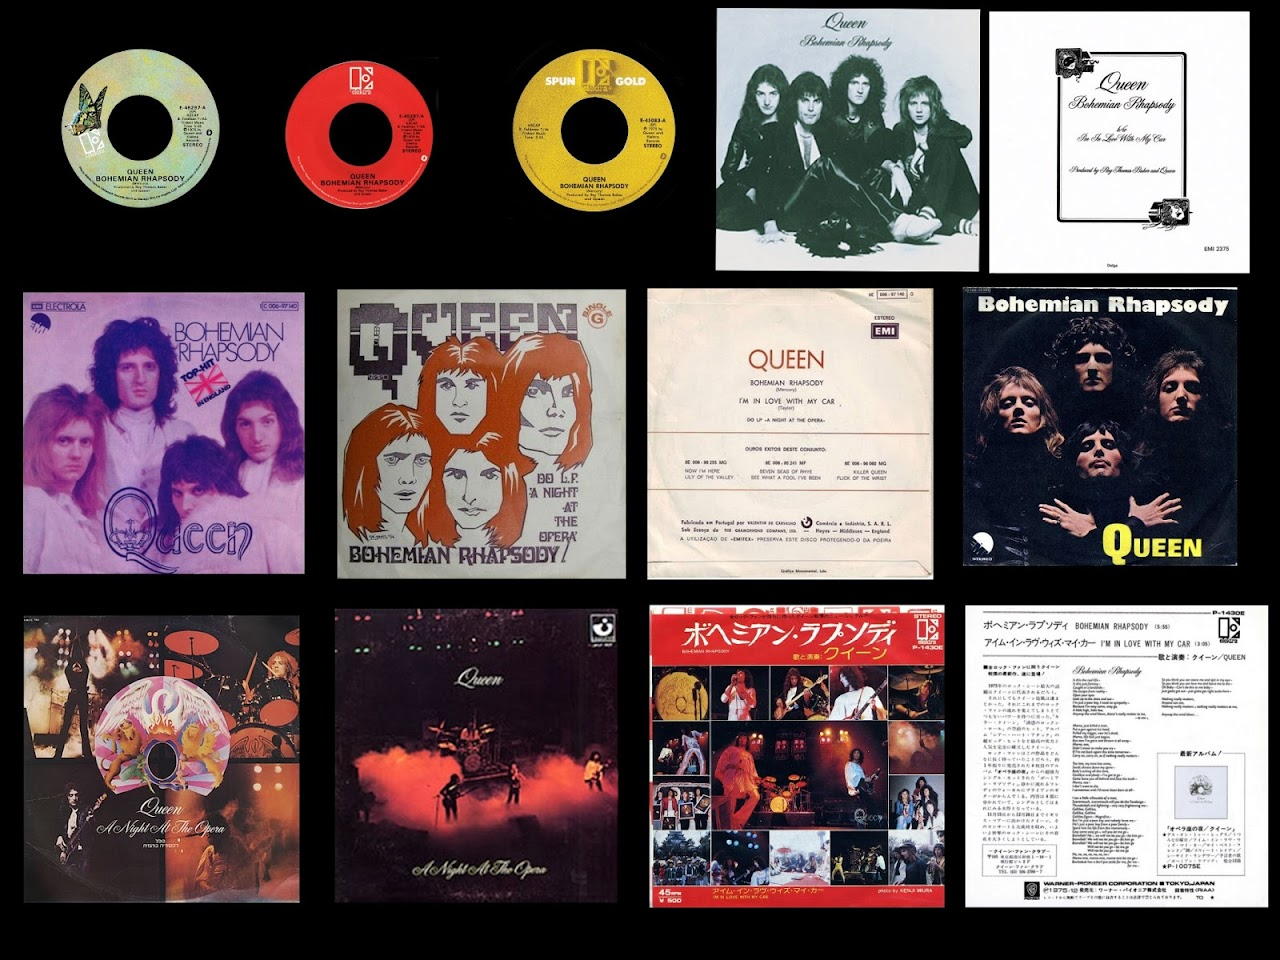 http://2.bp.blogspot.com/-y6Qov7zlyTY/Tim7LNj4jlI/AAAAAAAABMs/gMv-010FaaY/s1280/1+Sencillos+Bohemian+Rhapsody.jpg